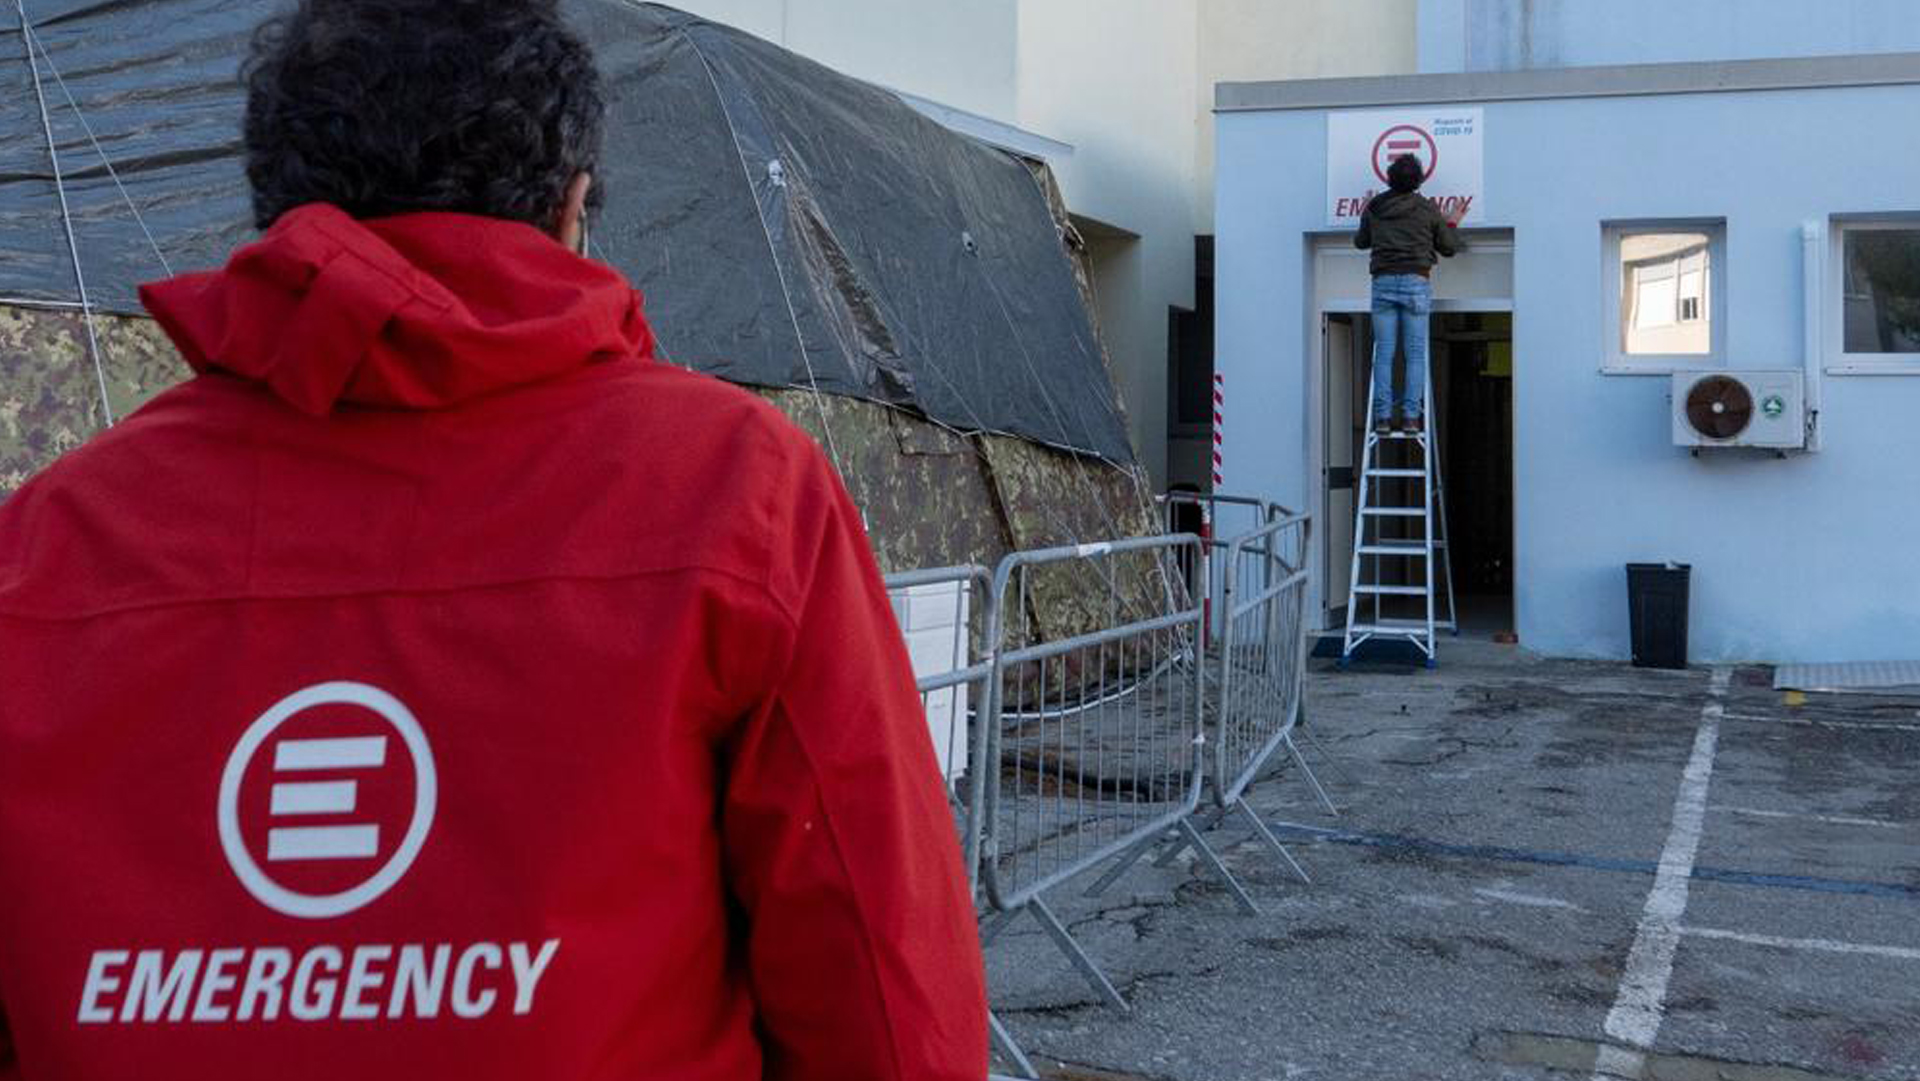 Emergency Calabria